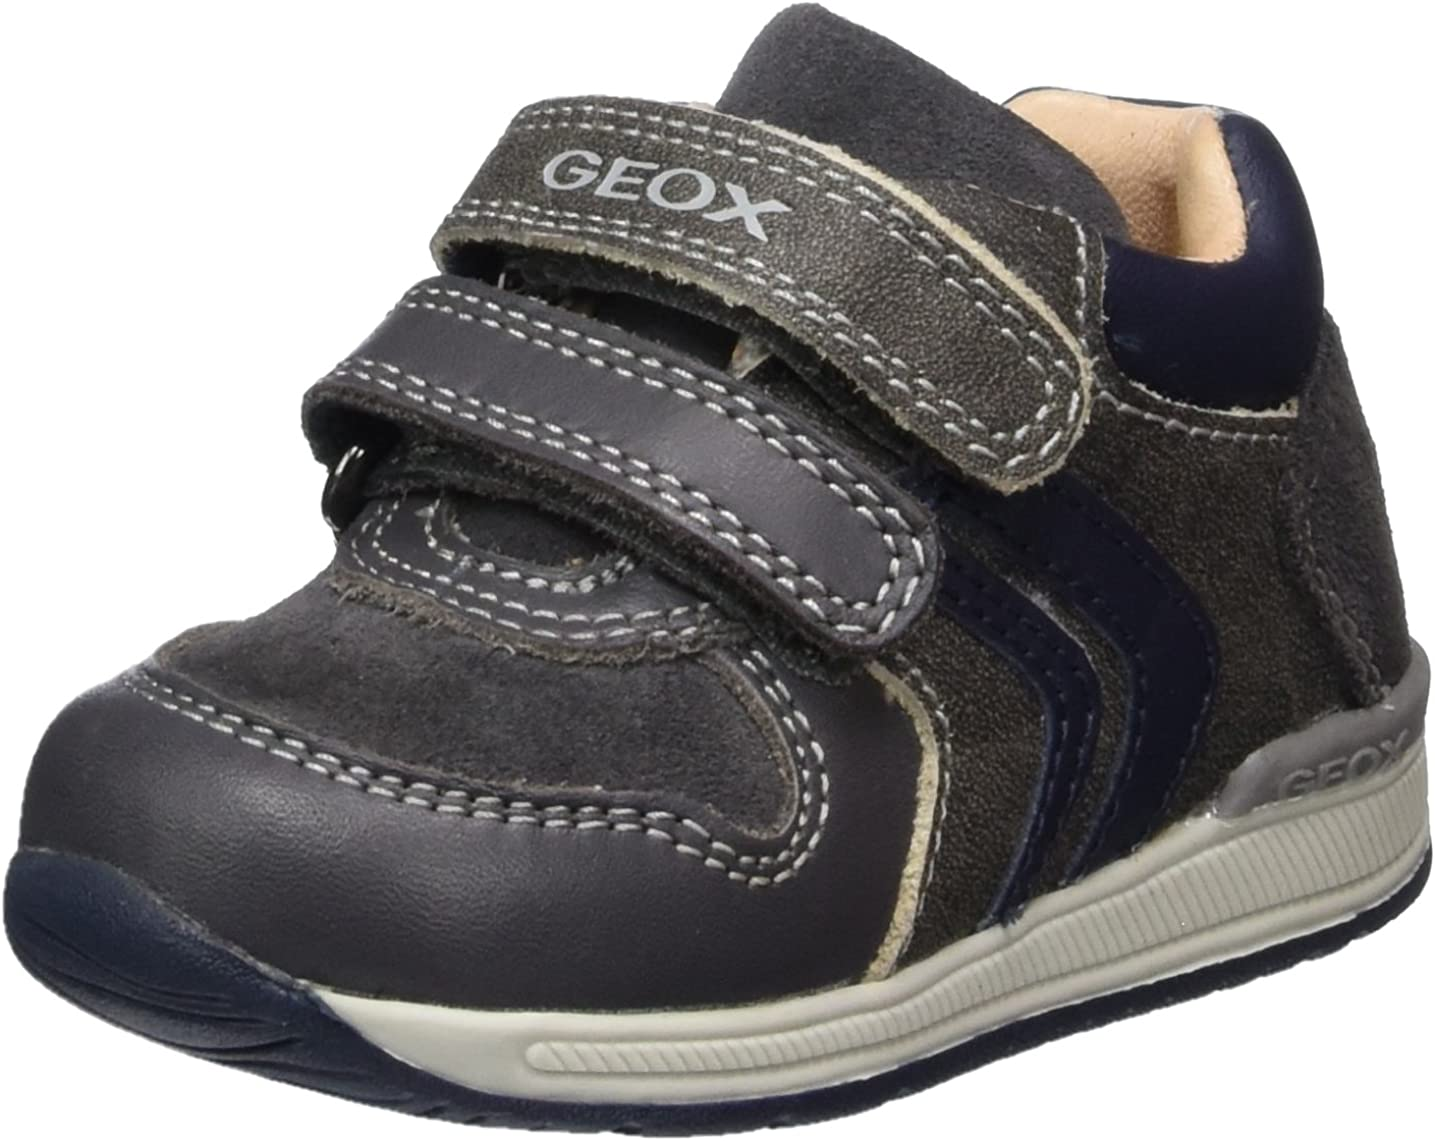 encuesta pausa Labor  Amazon.com | Geox Boy's Walking Baby Shoes Low-Top Sneakers | Sneakers